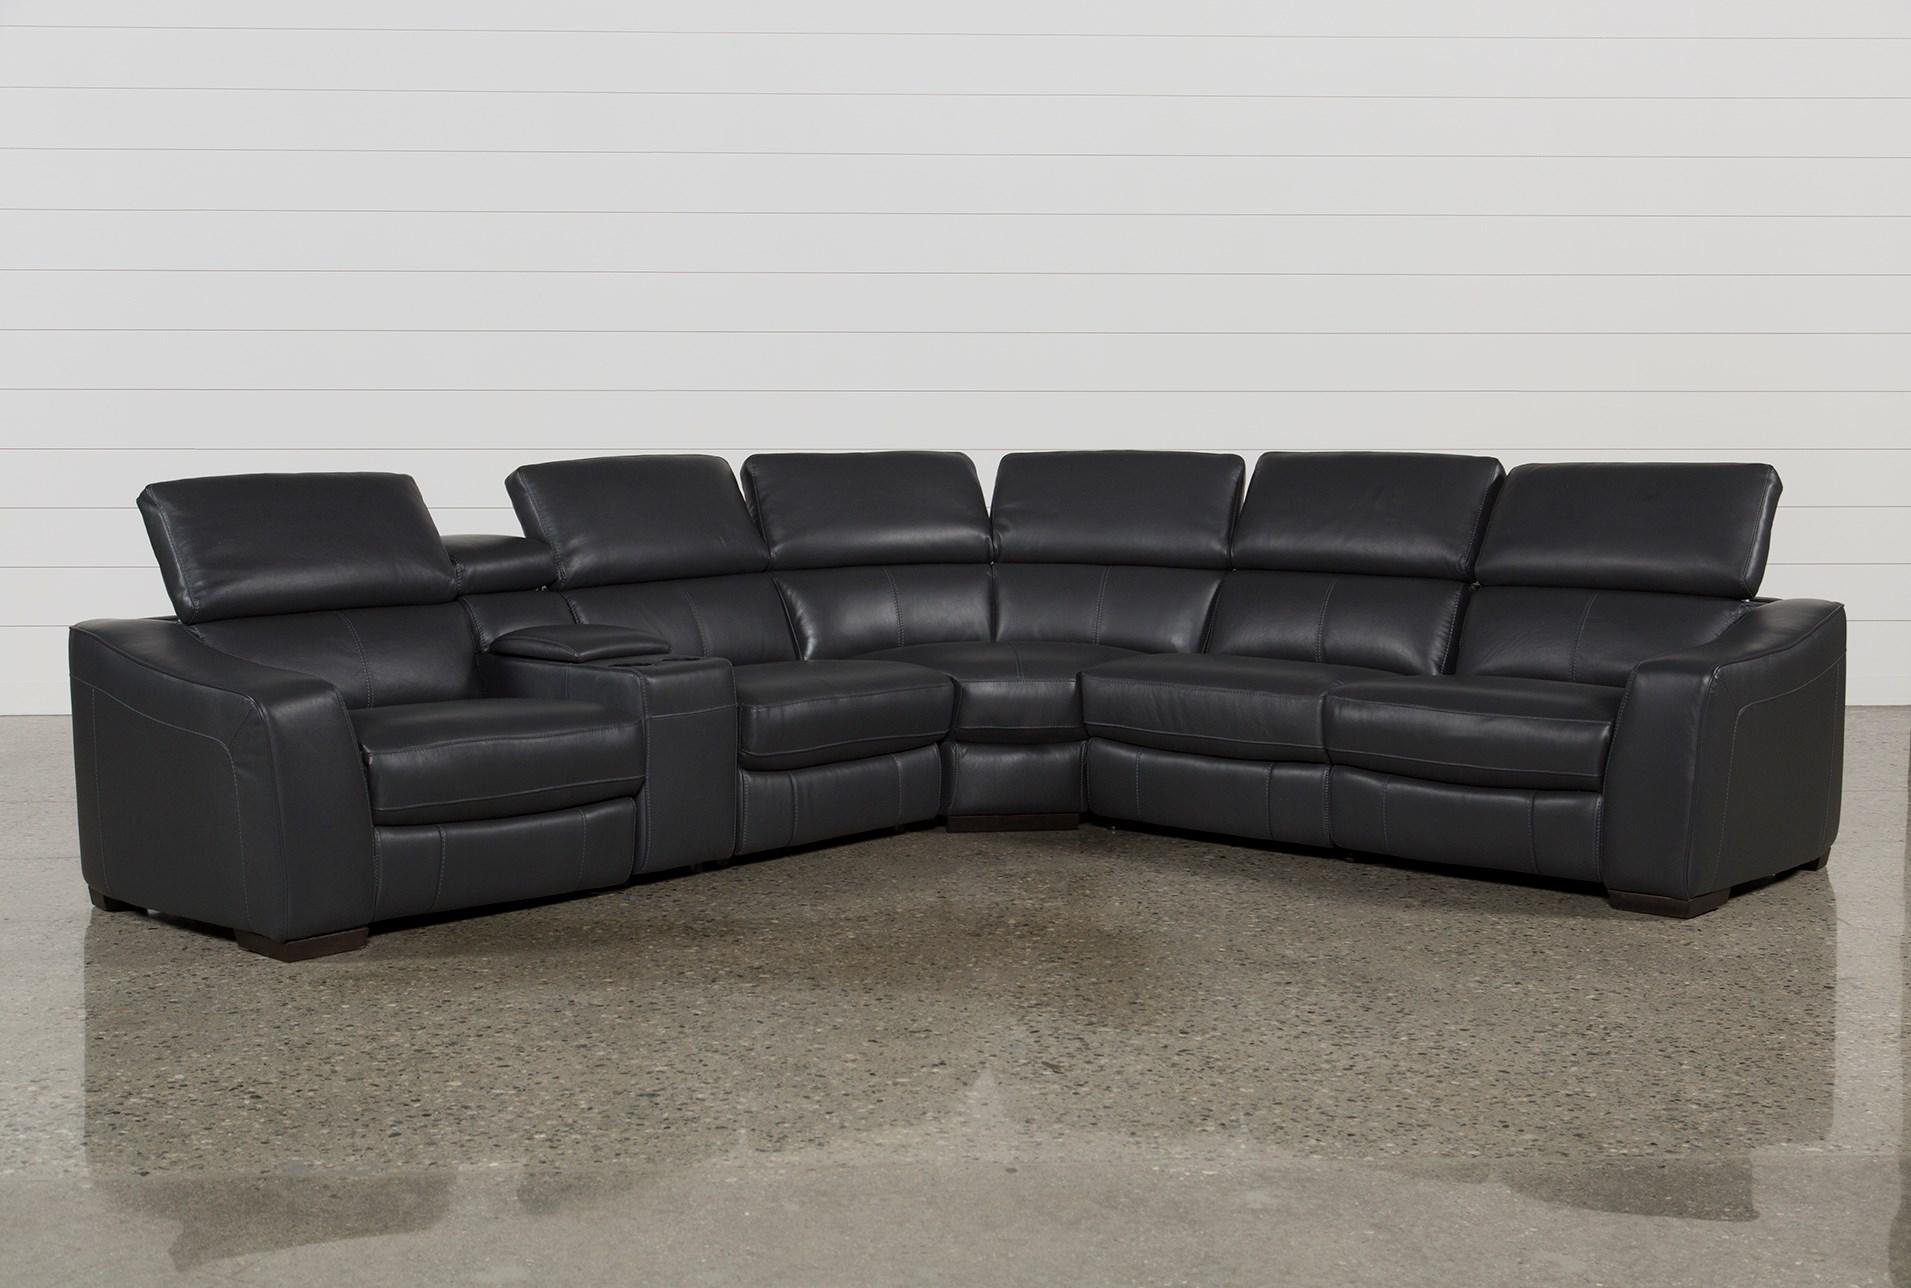 High Tech Furniture